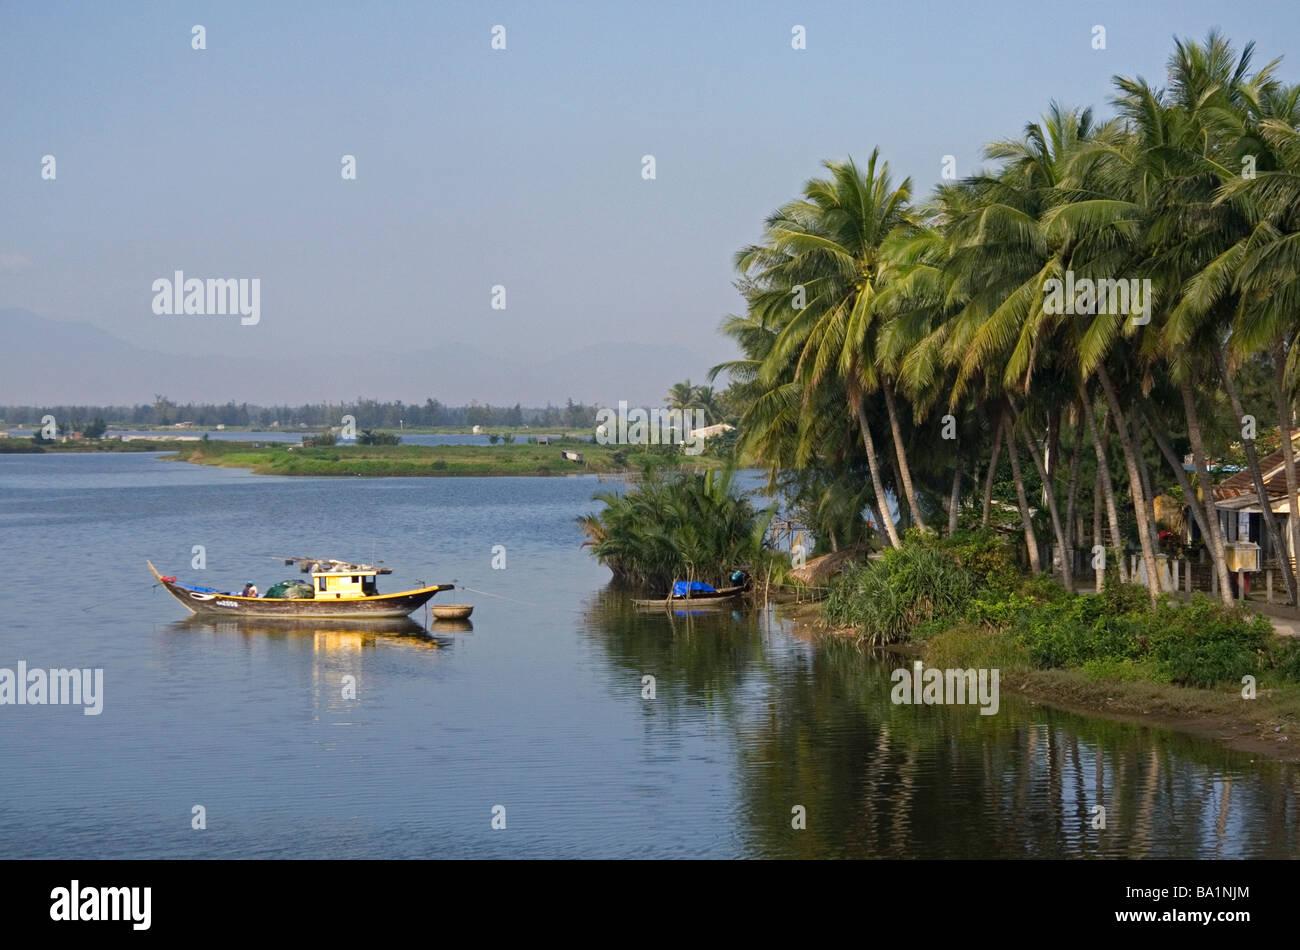 Boat on the Thu Bon River near Hoi An Vietnam - Stock Image